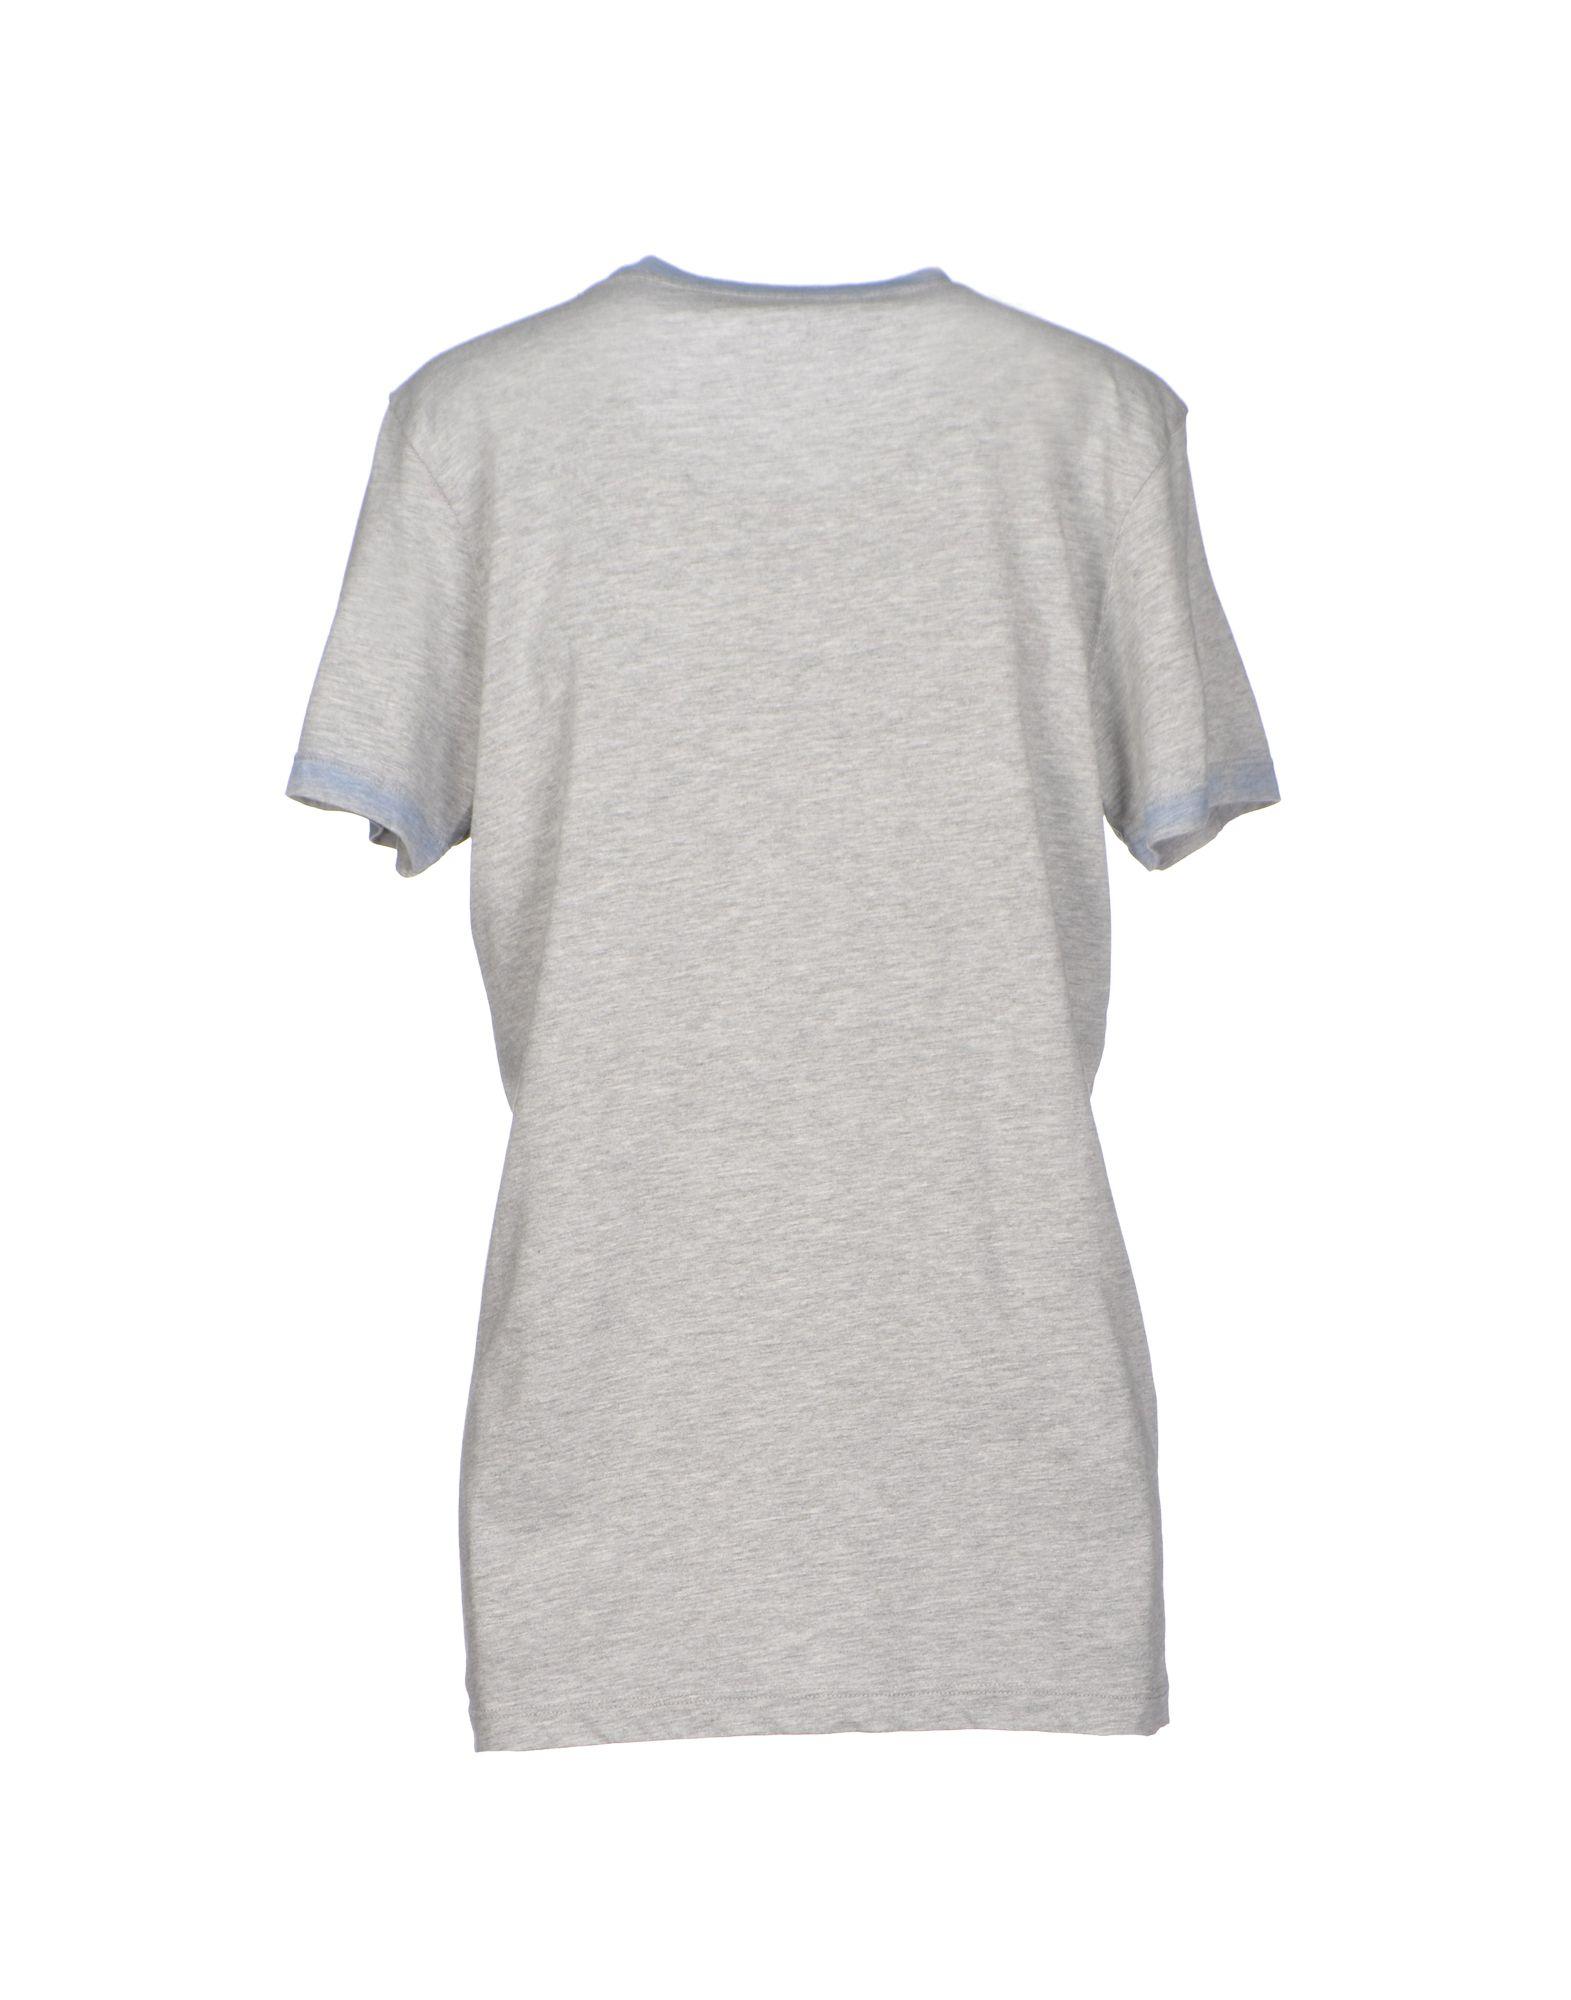 Kaos T-shirt in Gray (Grey)   Lyst